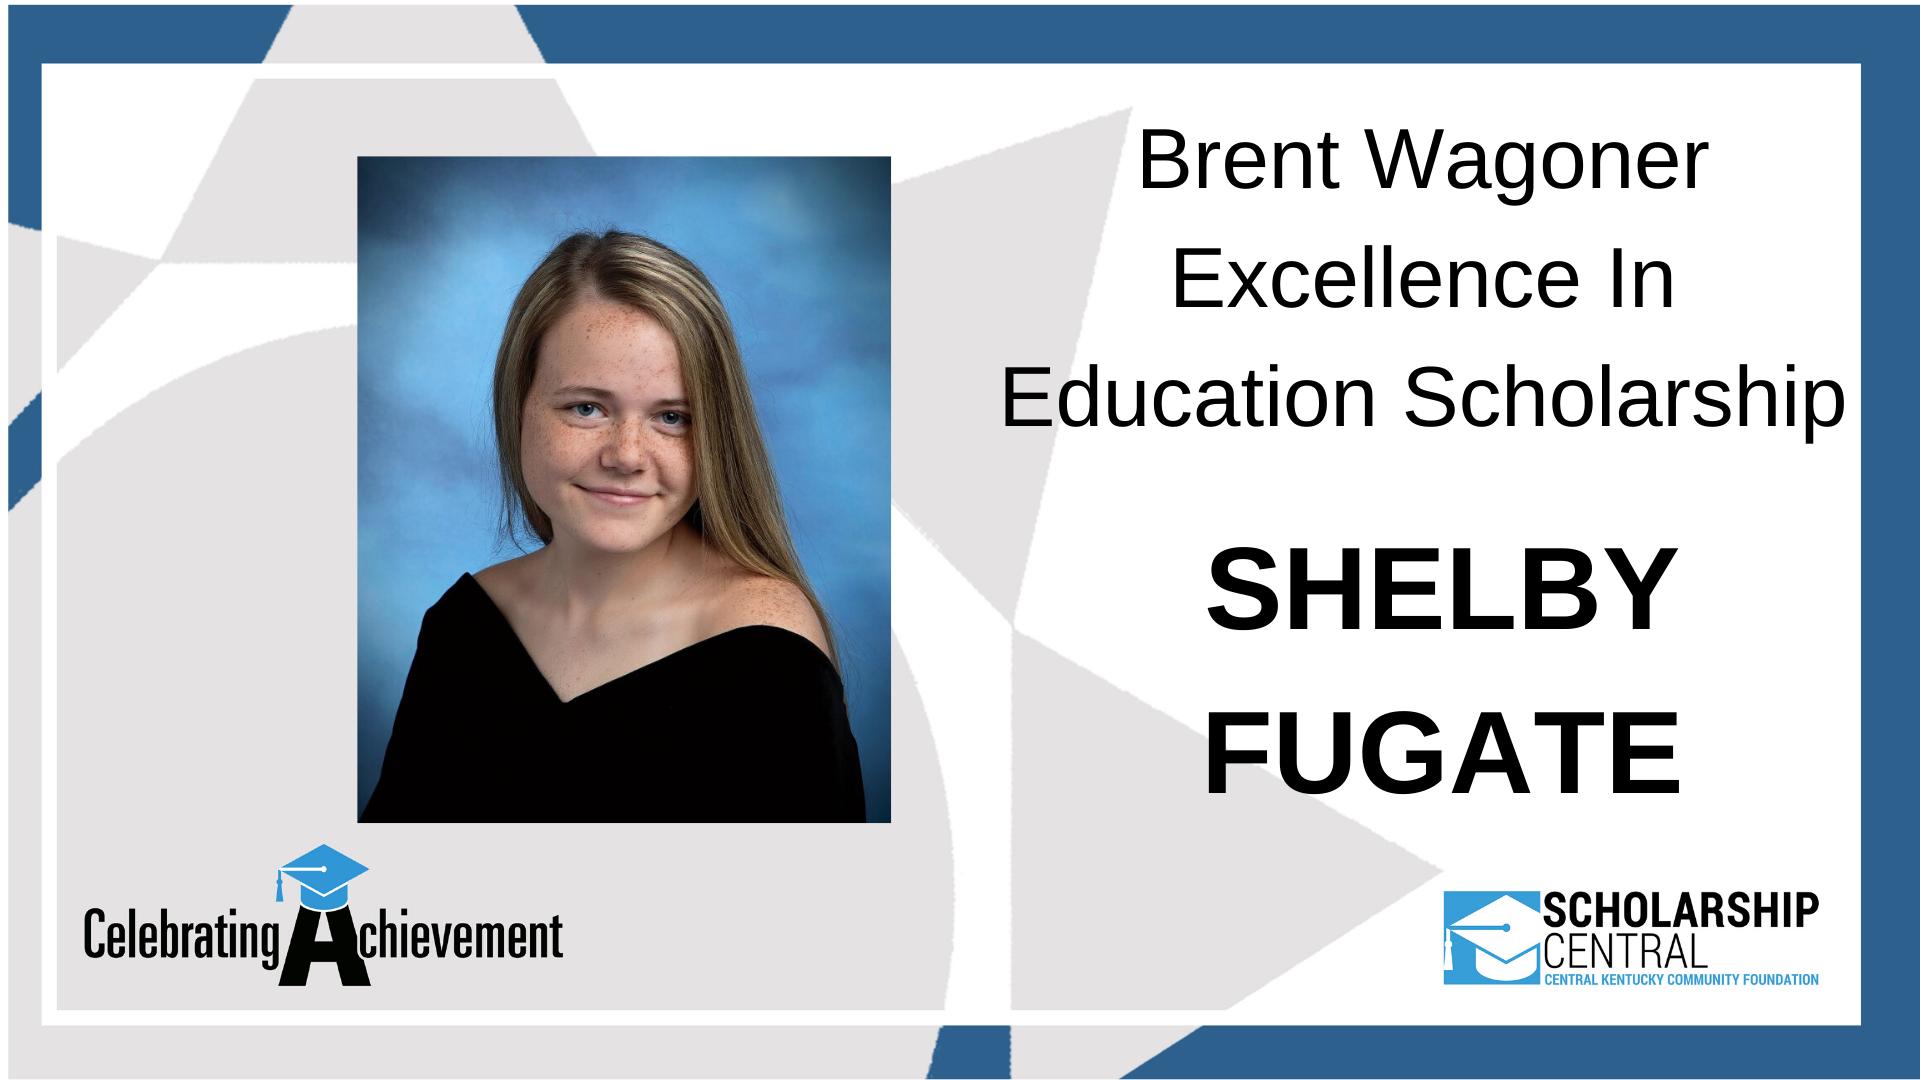 Brent Wagoner Scholarship